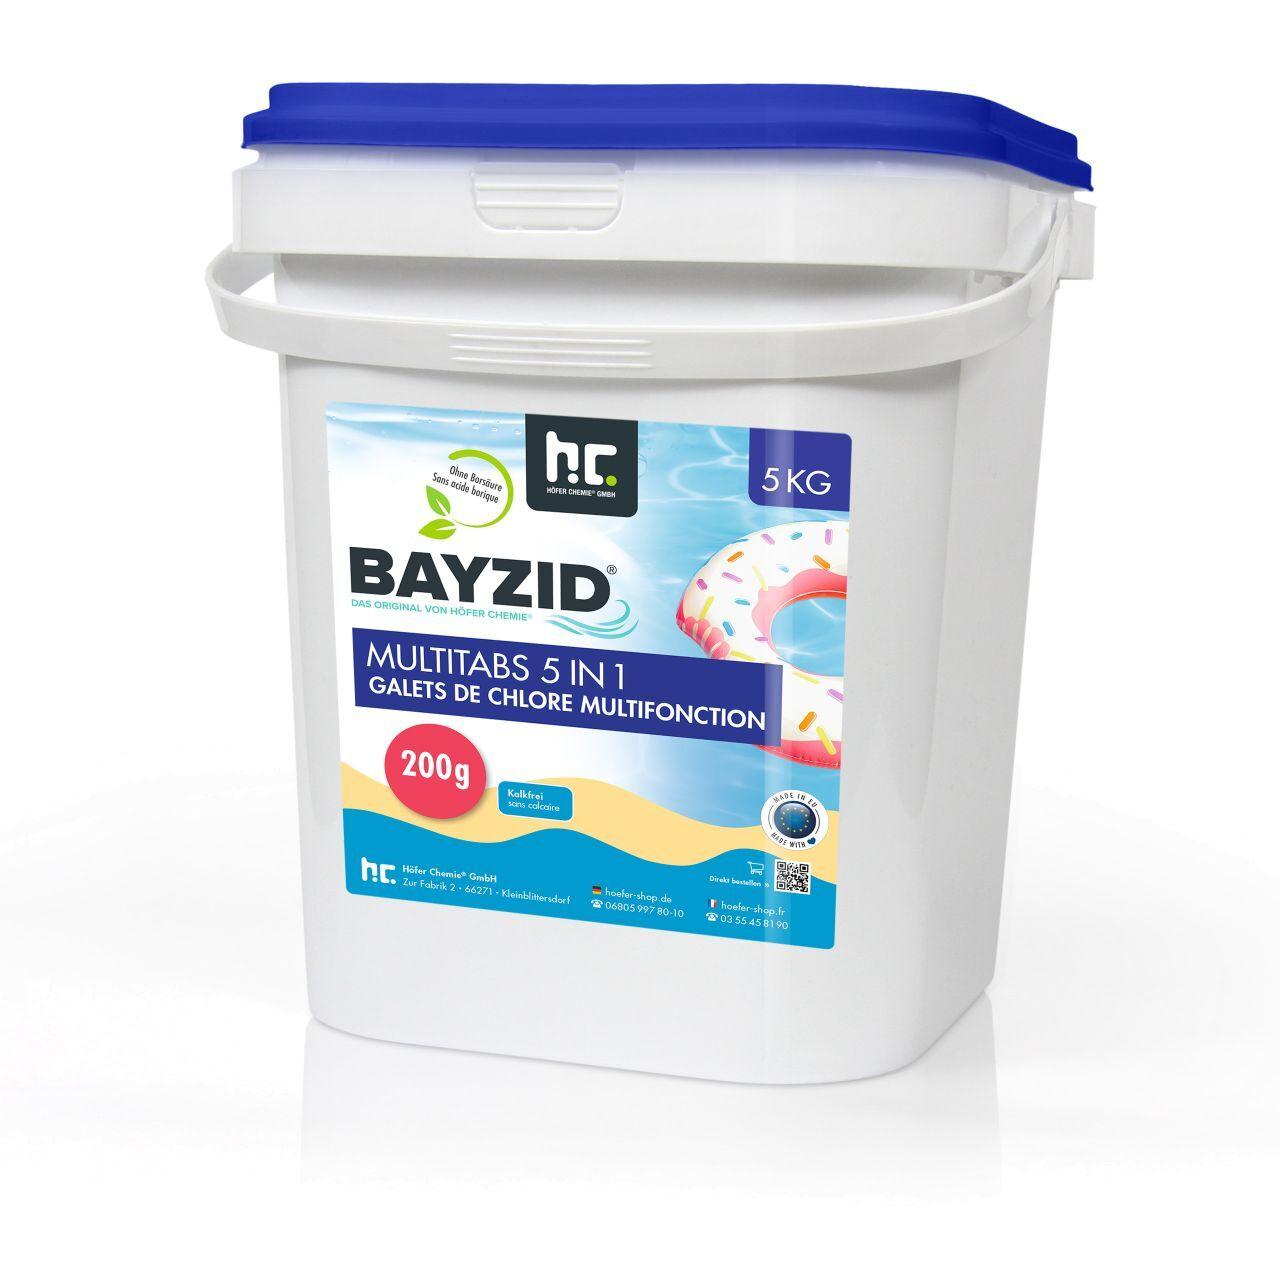 BAYZID 5 kg Bayzid® Galets de chlore multifonction (200g) (1 x 5 kg)